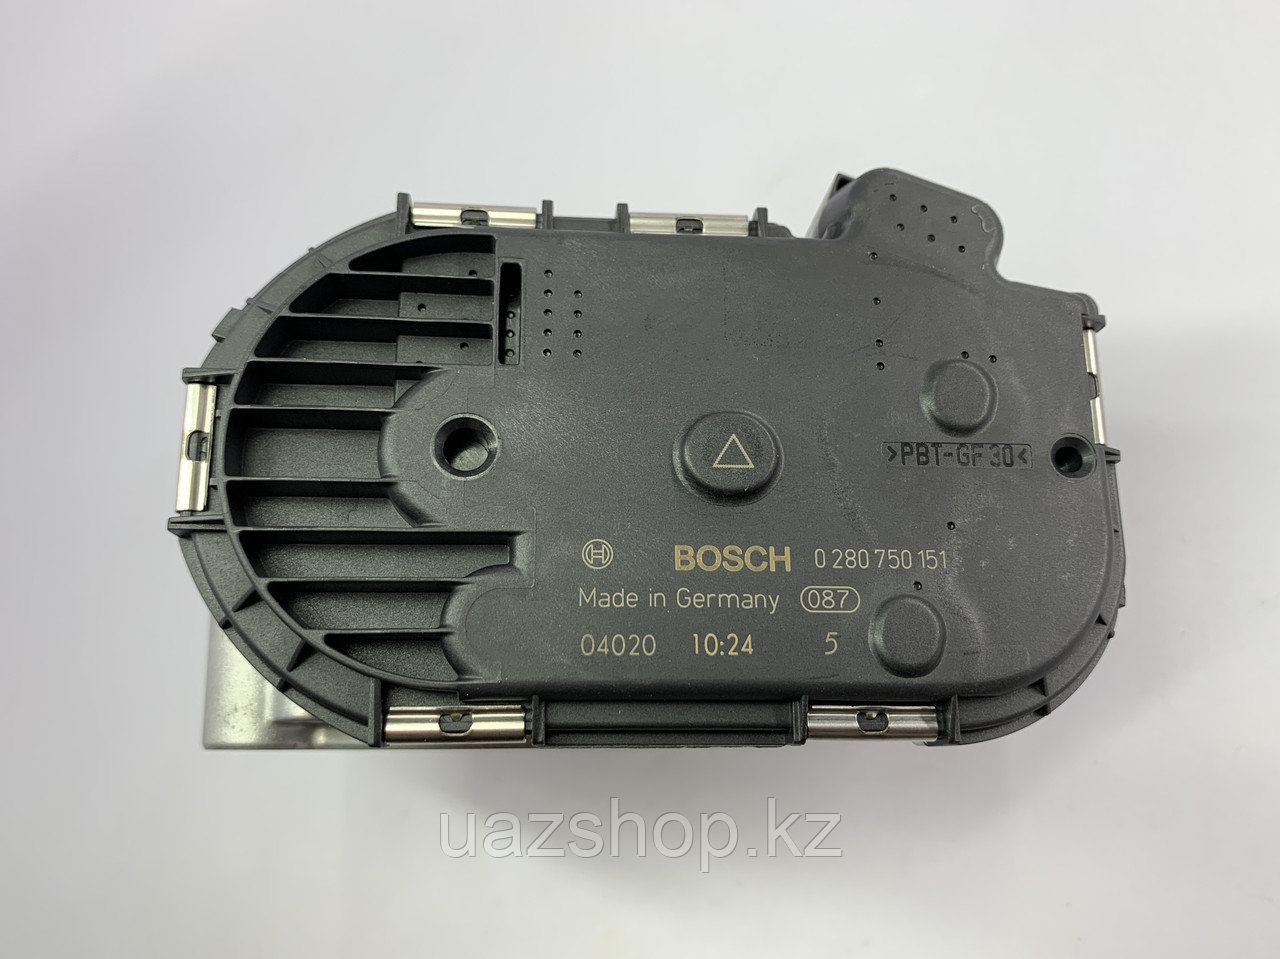 Электронная дросельная заслонка для ЗМЗ 409